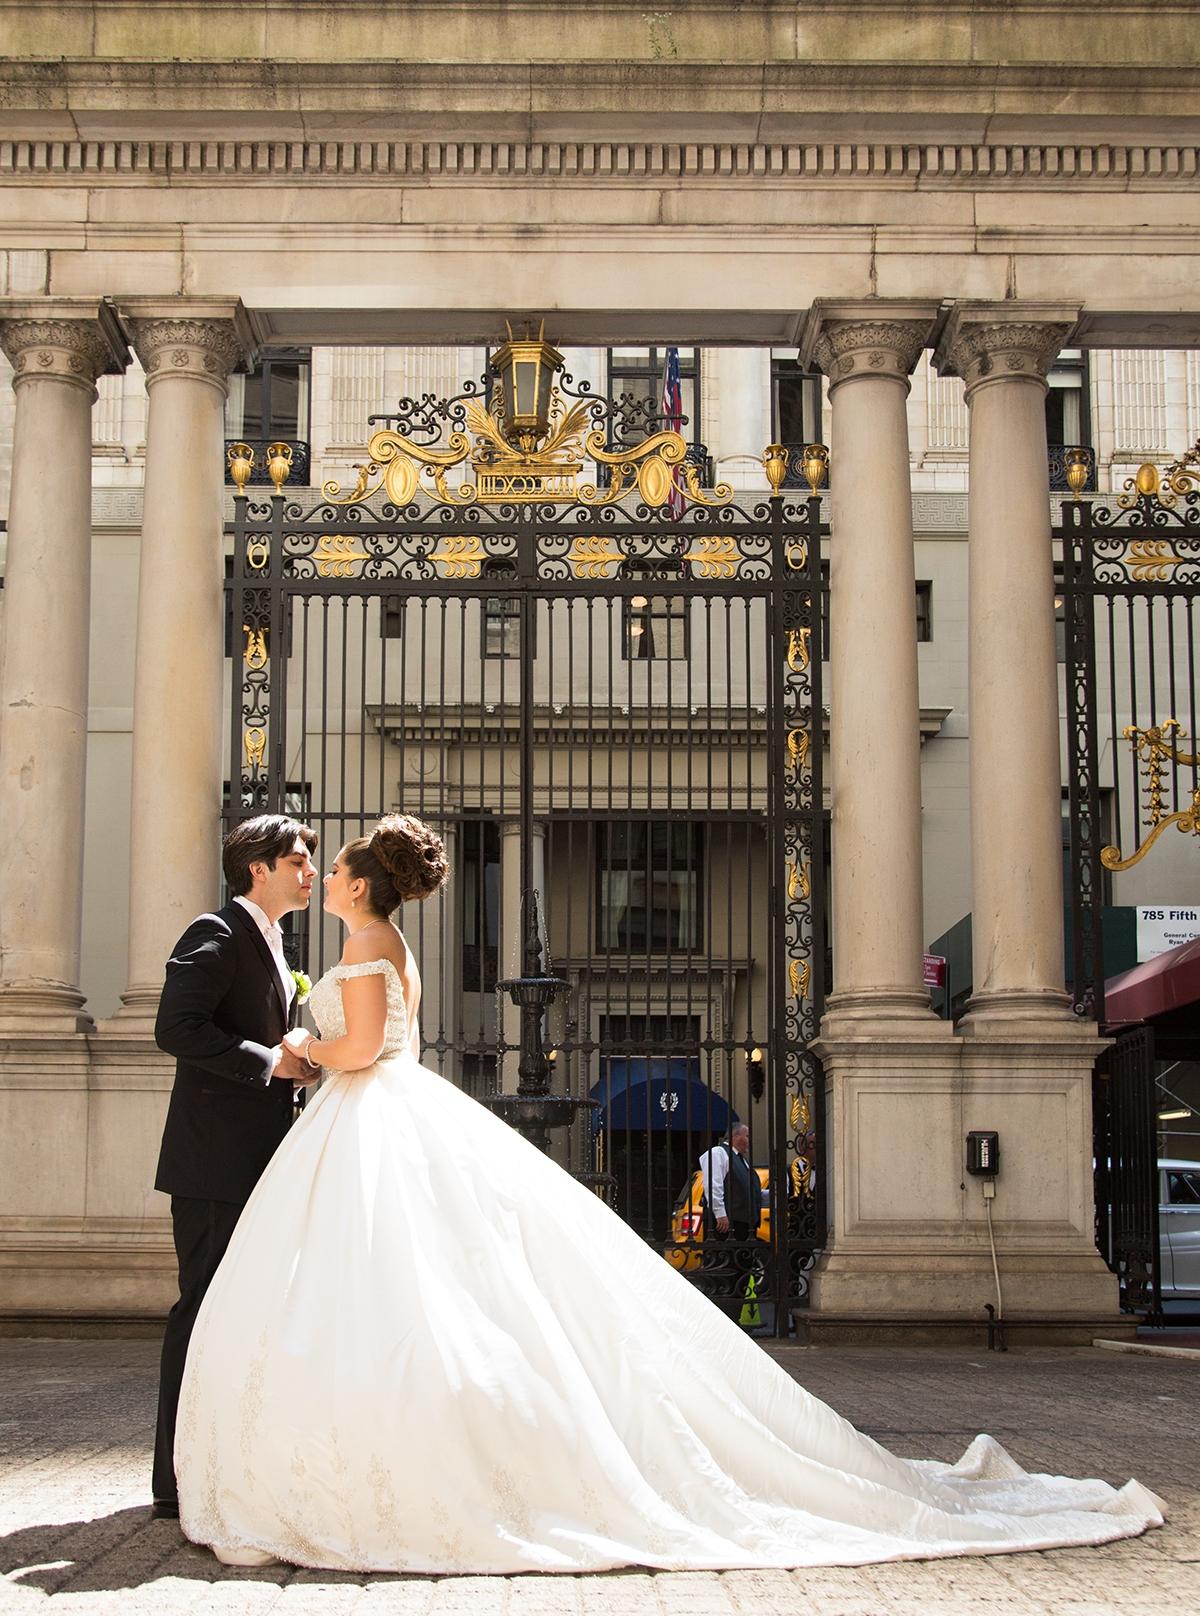 jamie-levine-photography-metropolitan-club-new-york-wedding (1).jpg